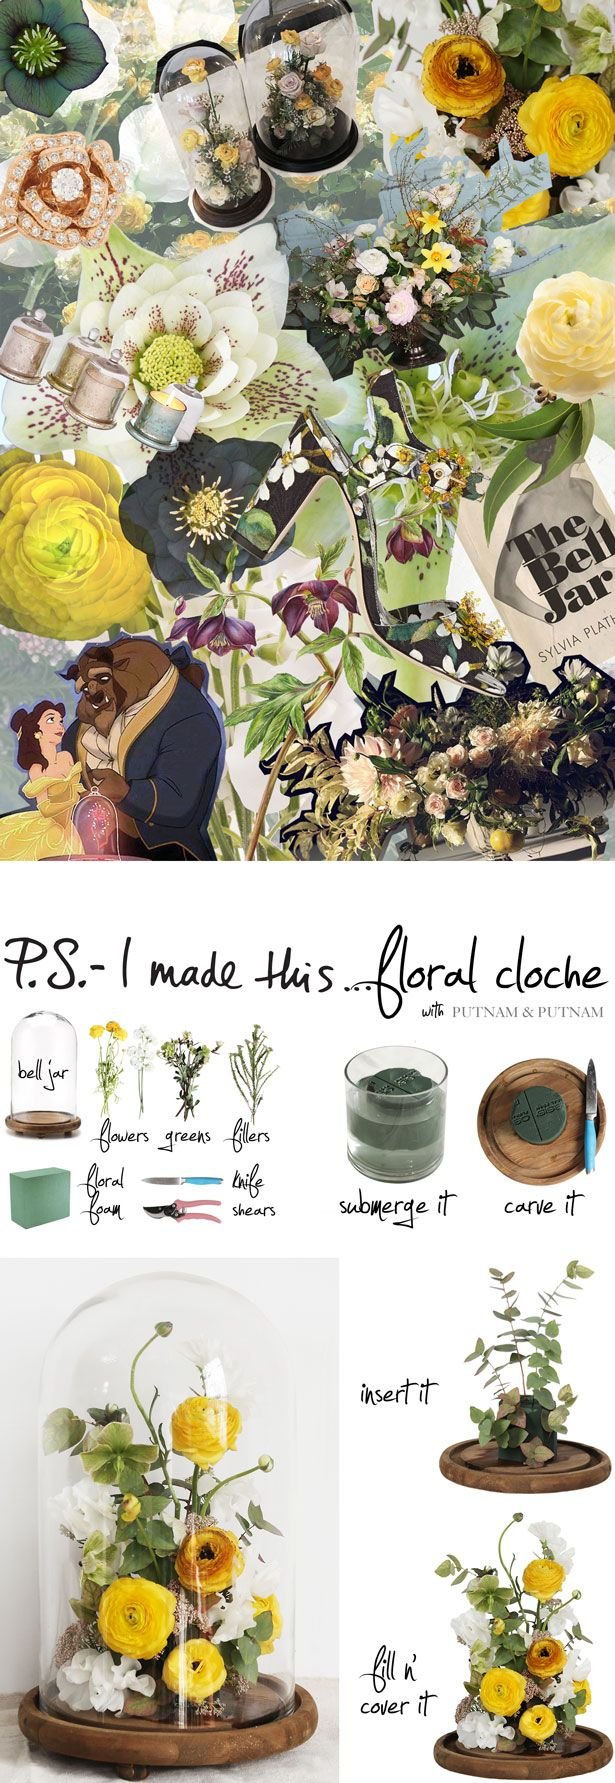 P.S.- I made this...Floral Cloche with Putnam & Putnam Floral Design #PSIMADETHIS #DIY